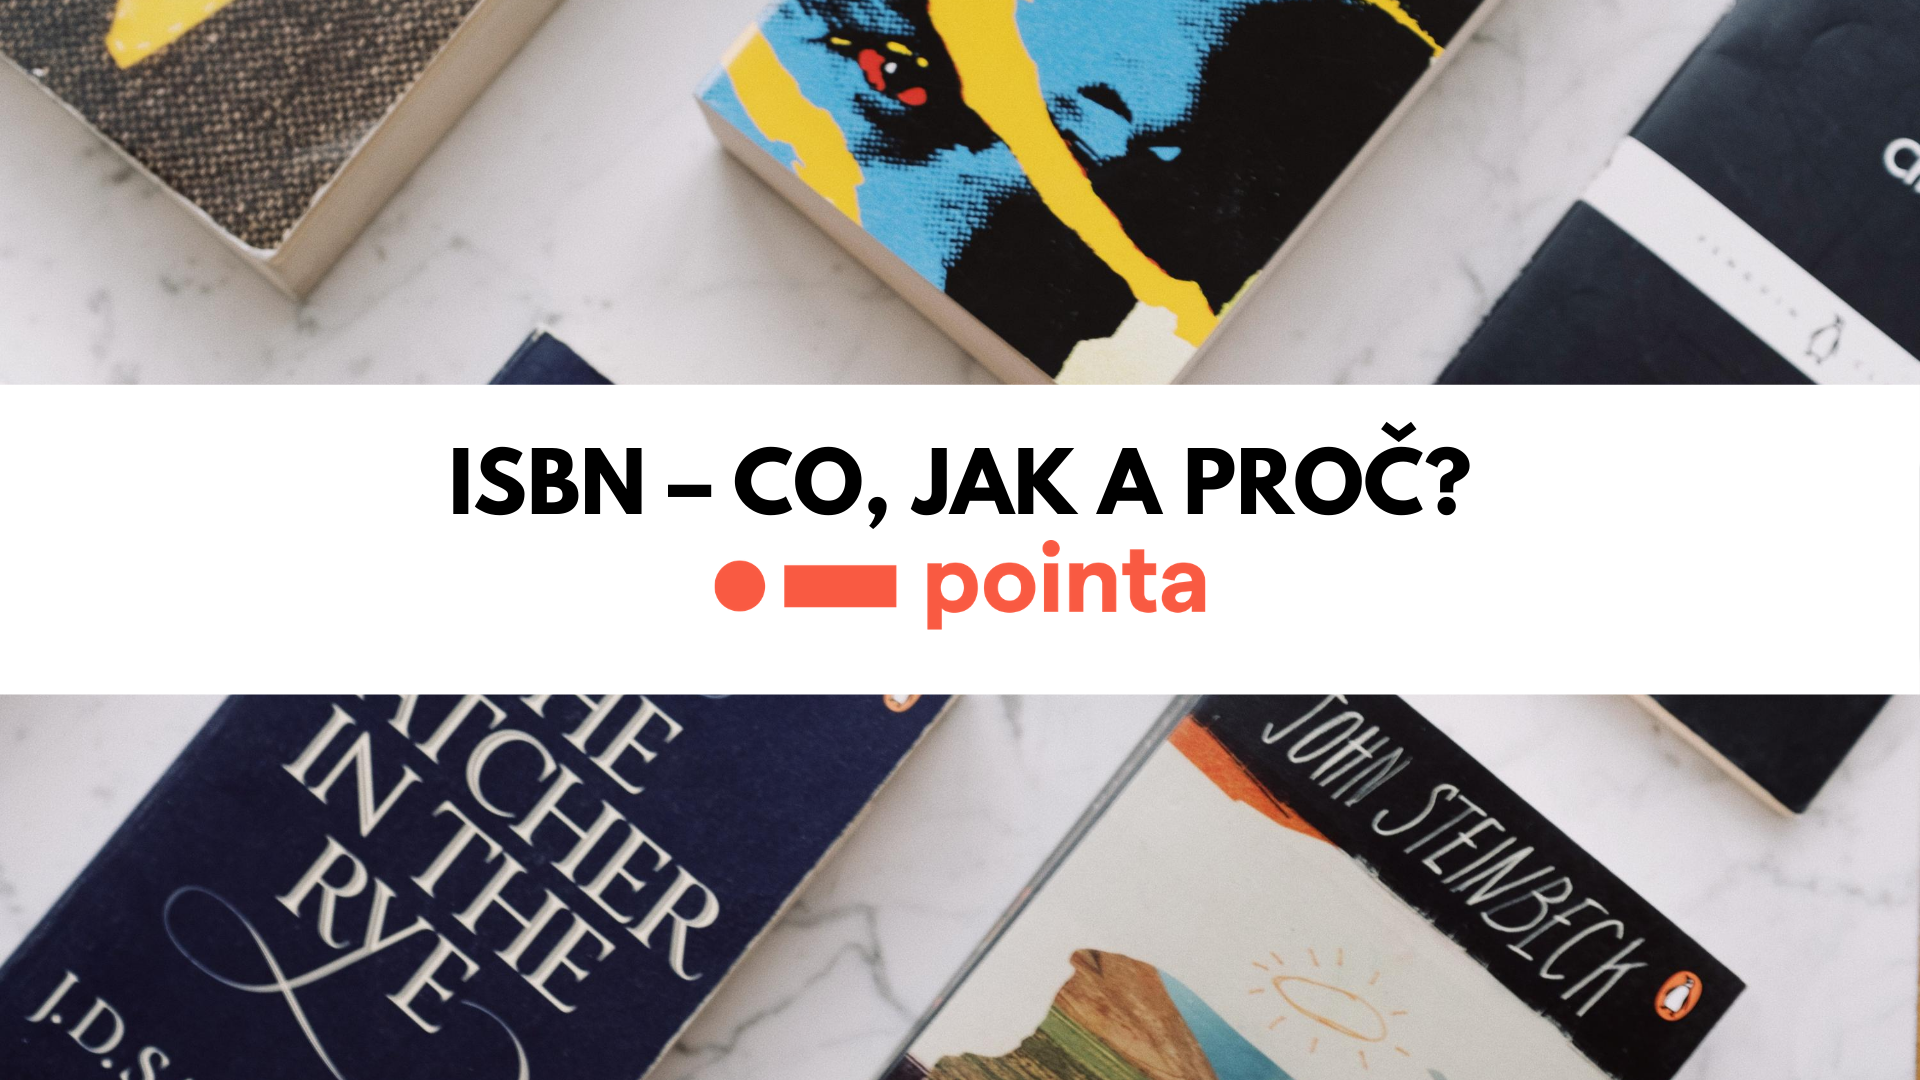 ISBN – co, jak a proč